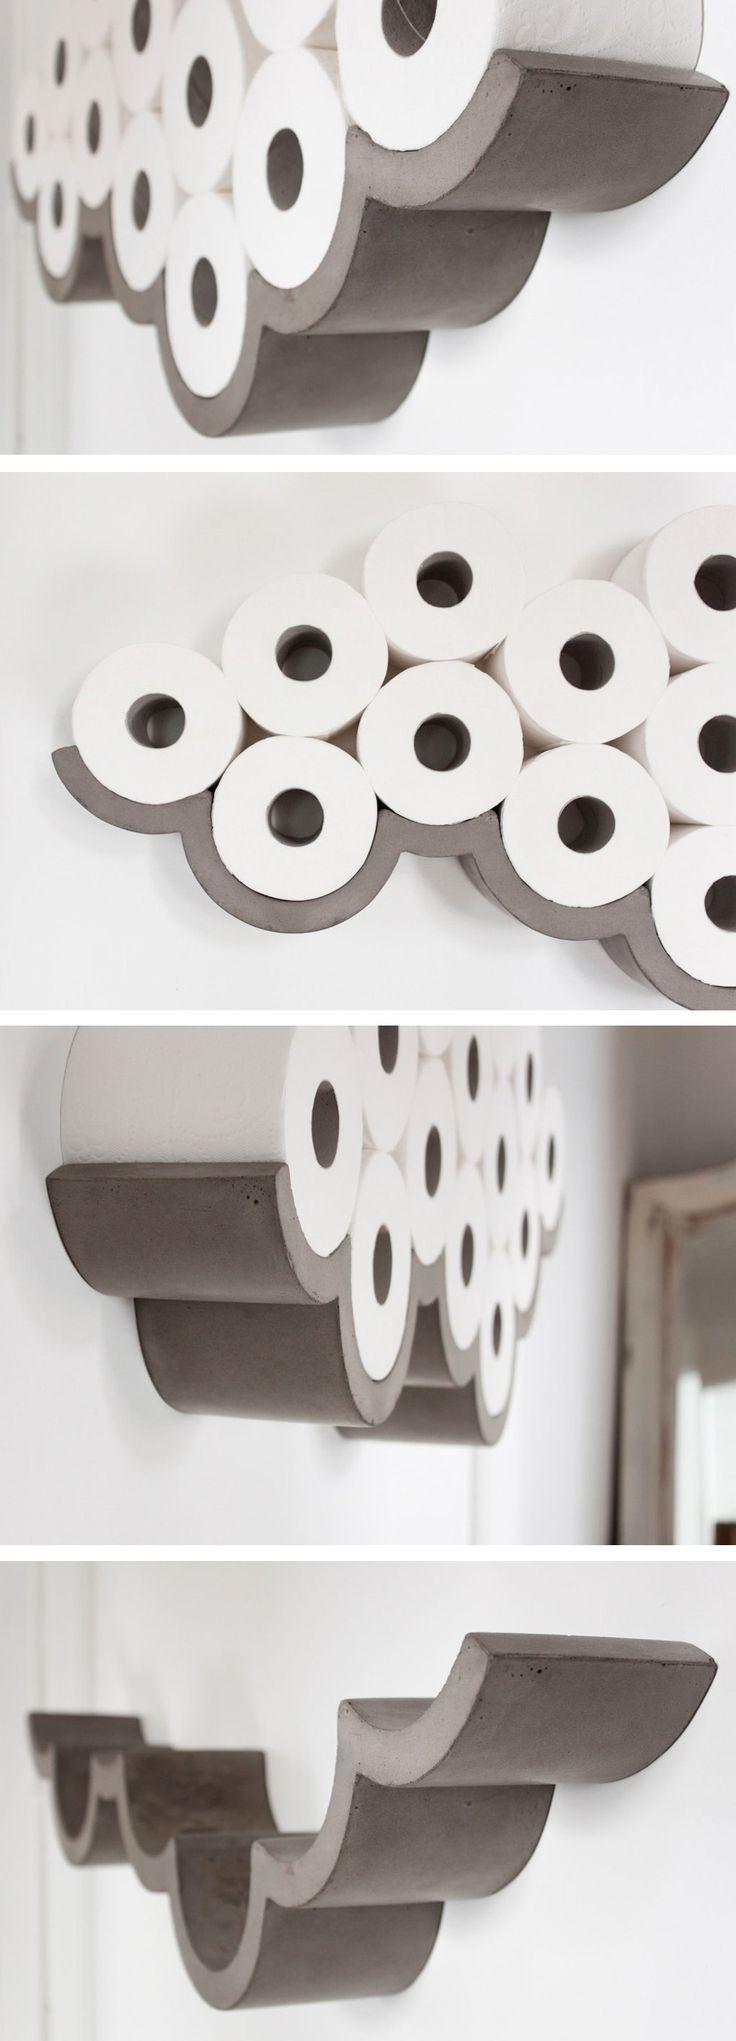 Best 25+ Bathroom Wall Art Ideas On Pinterest | Wall Decor For For Wall Art For The Bathroom (View 2 of 20)